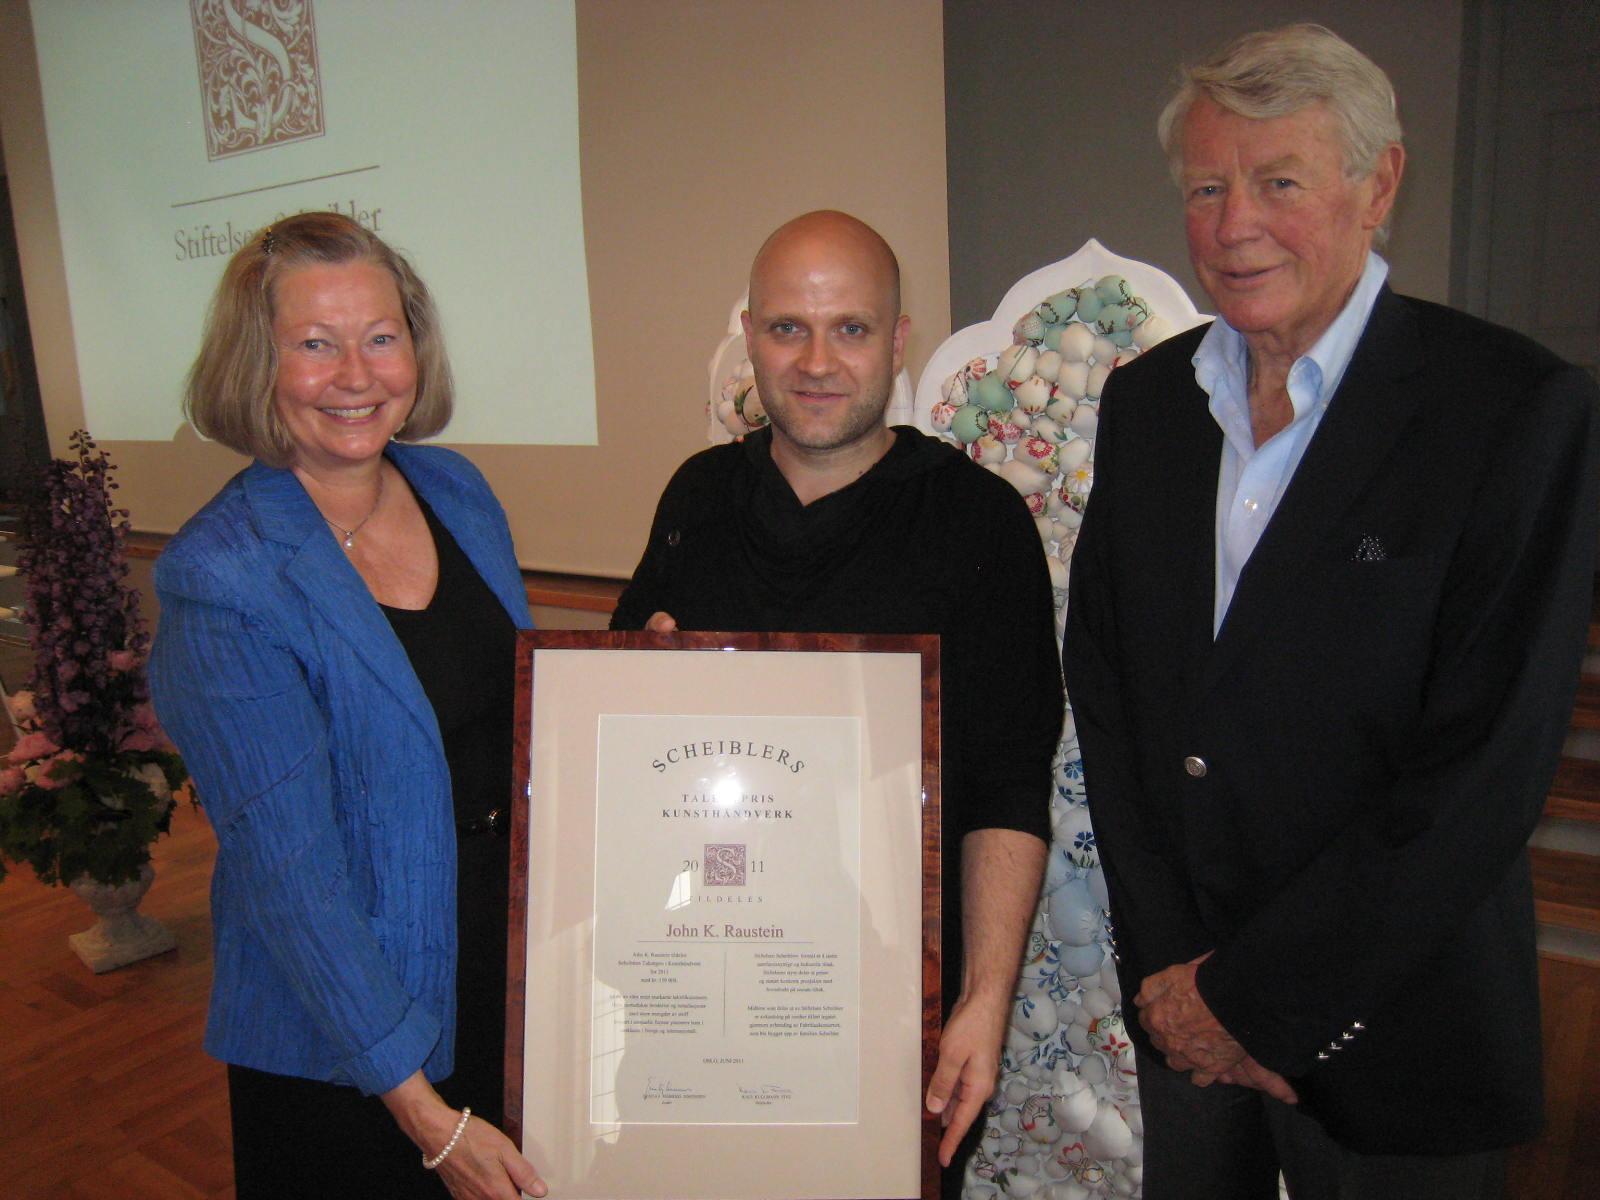 2011 Talentpris i kunsthåndverk: John K. Raustein